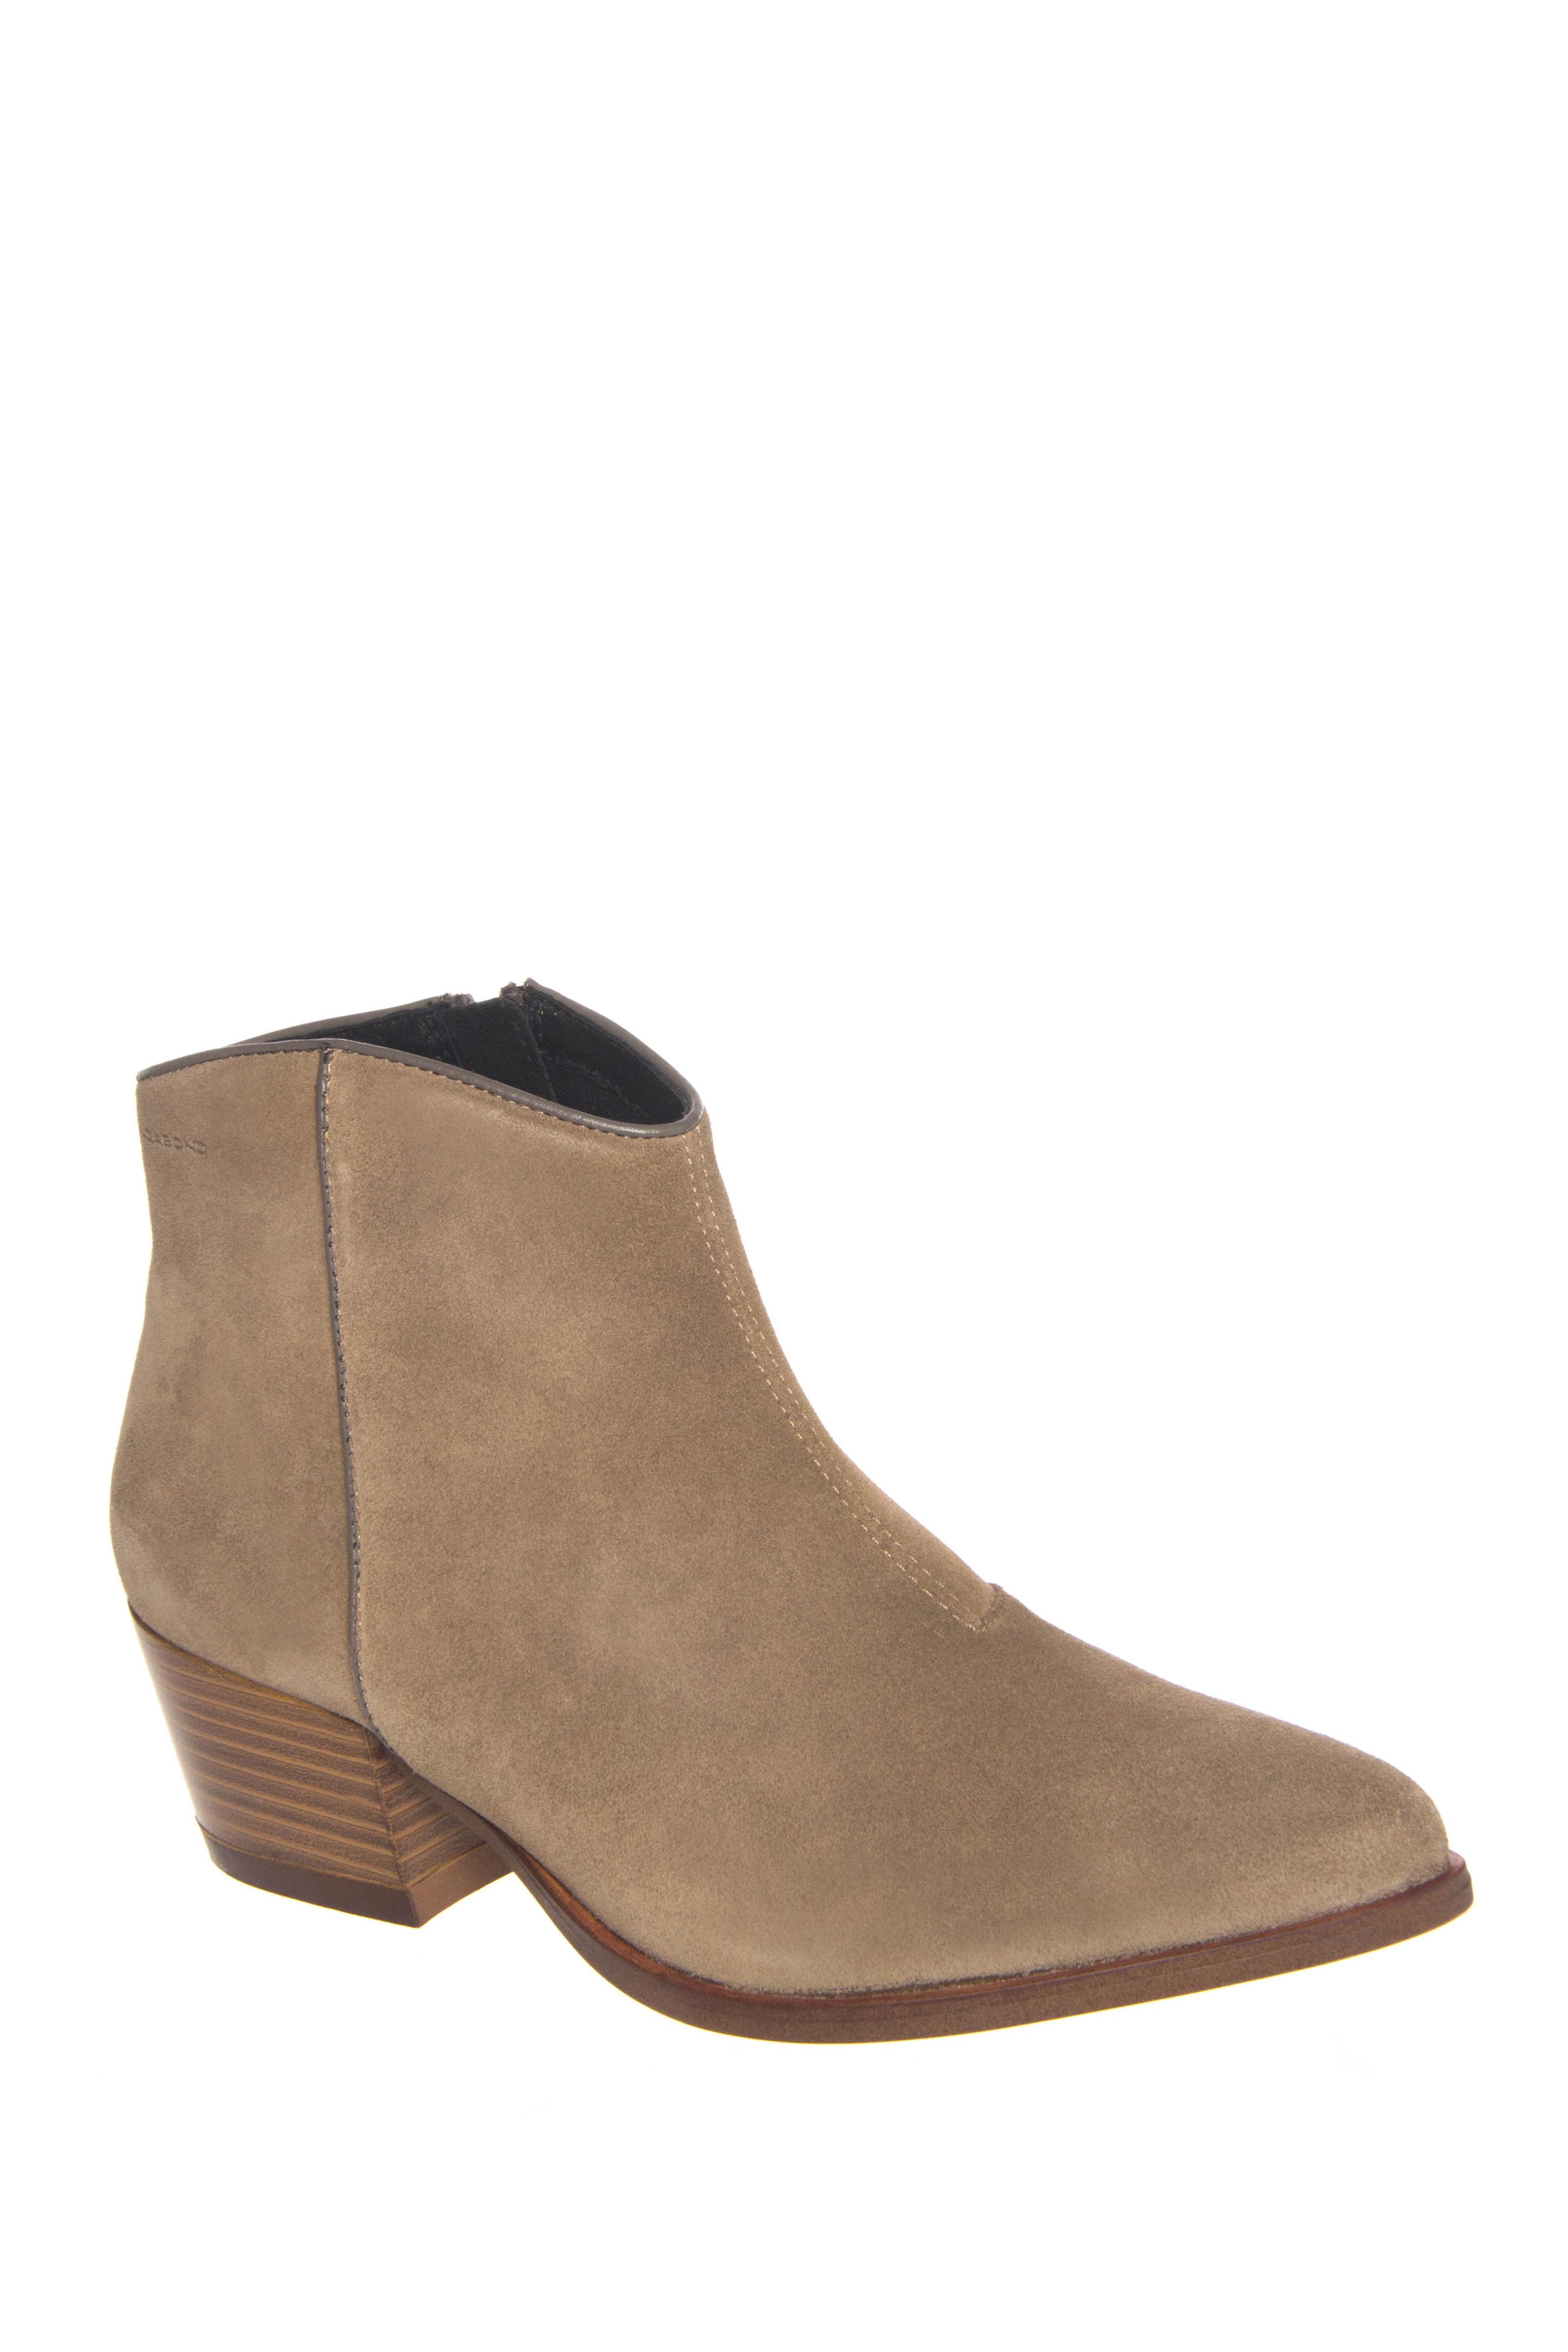 Vagabond Mandy Mid Heel Ankle Boots - Taupe